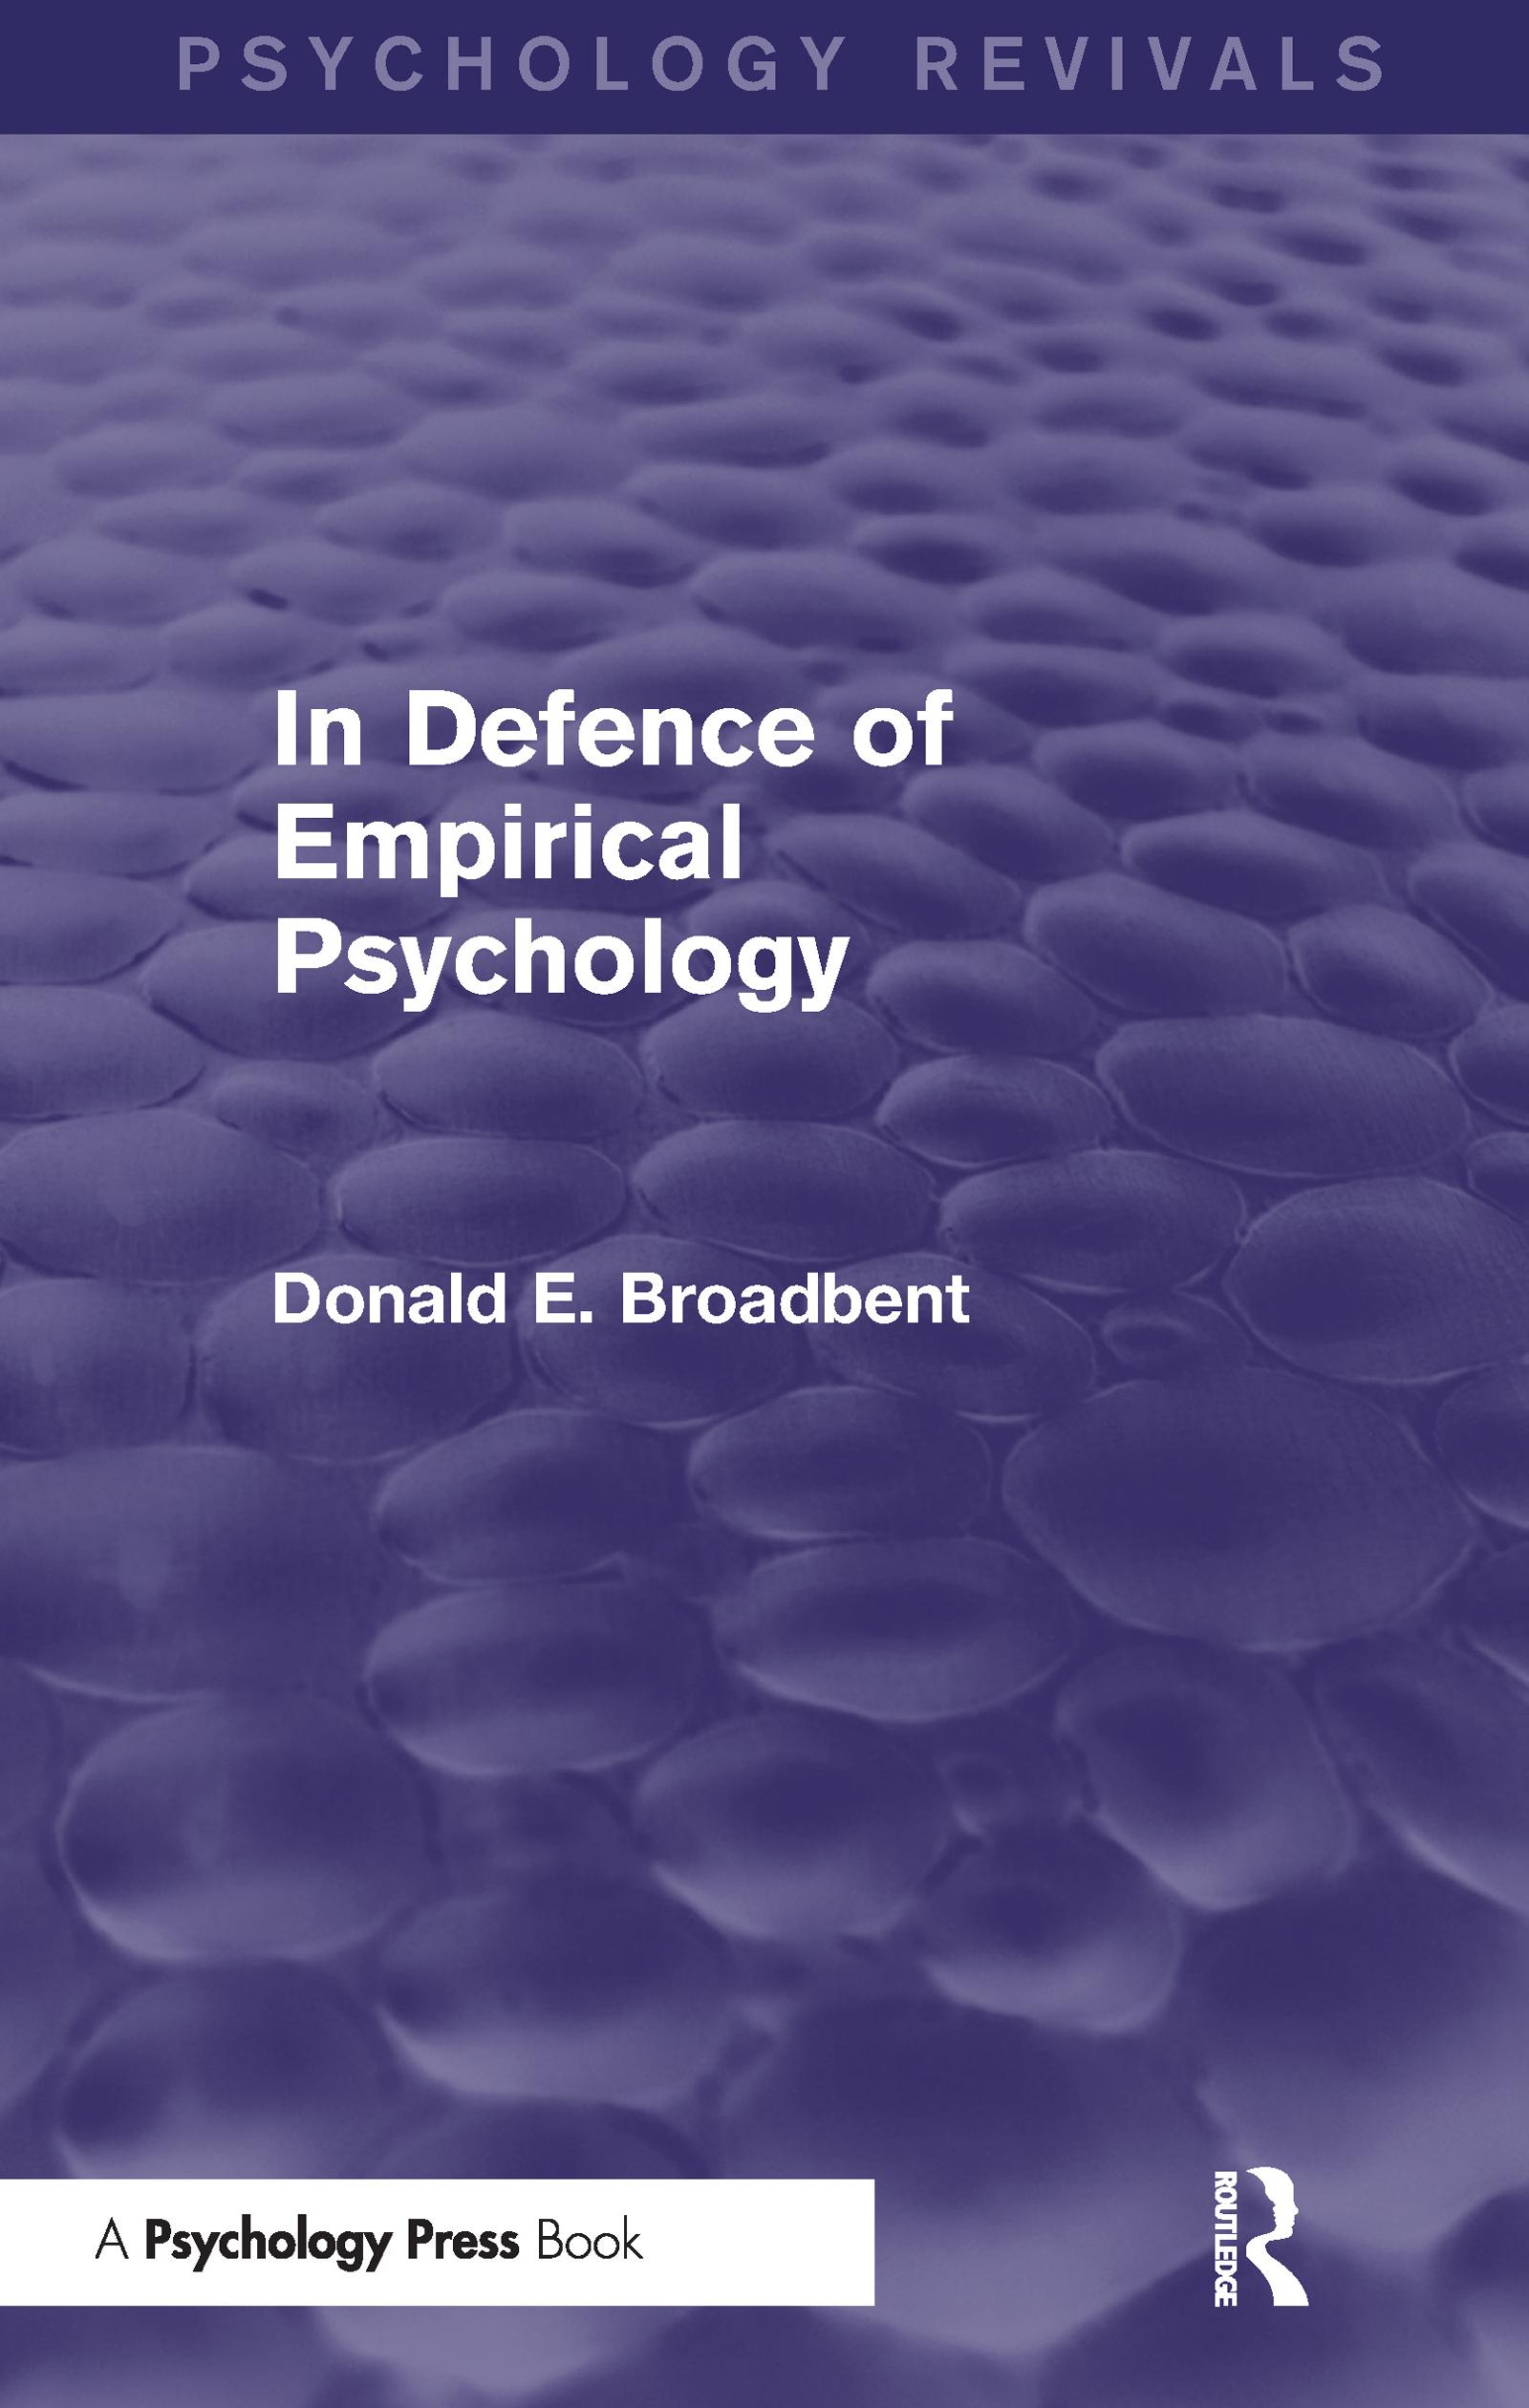 In Defence of Empirical Psychology (Psychology Revivals)